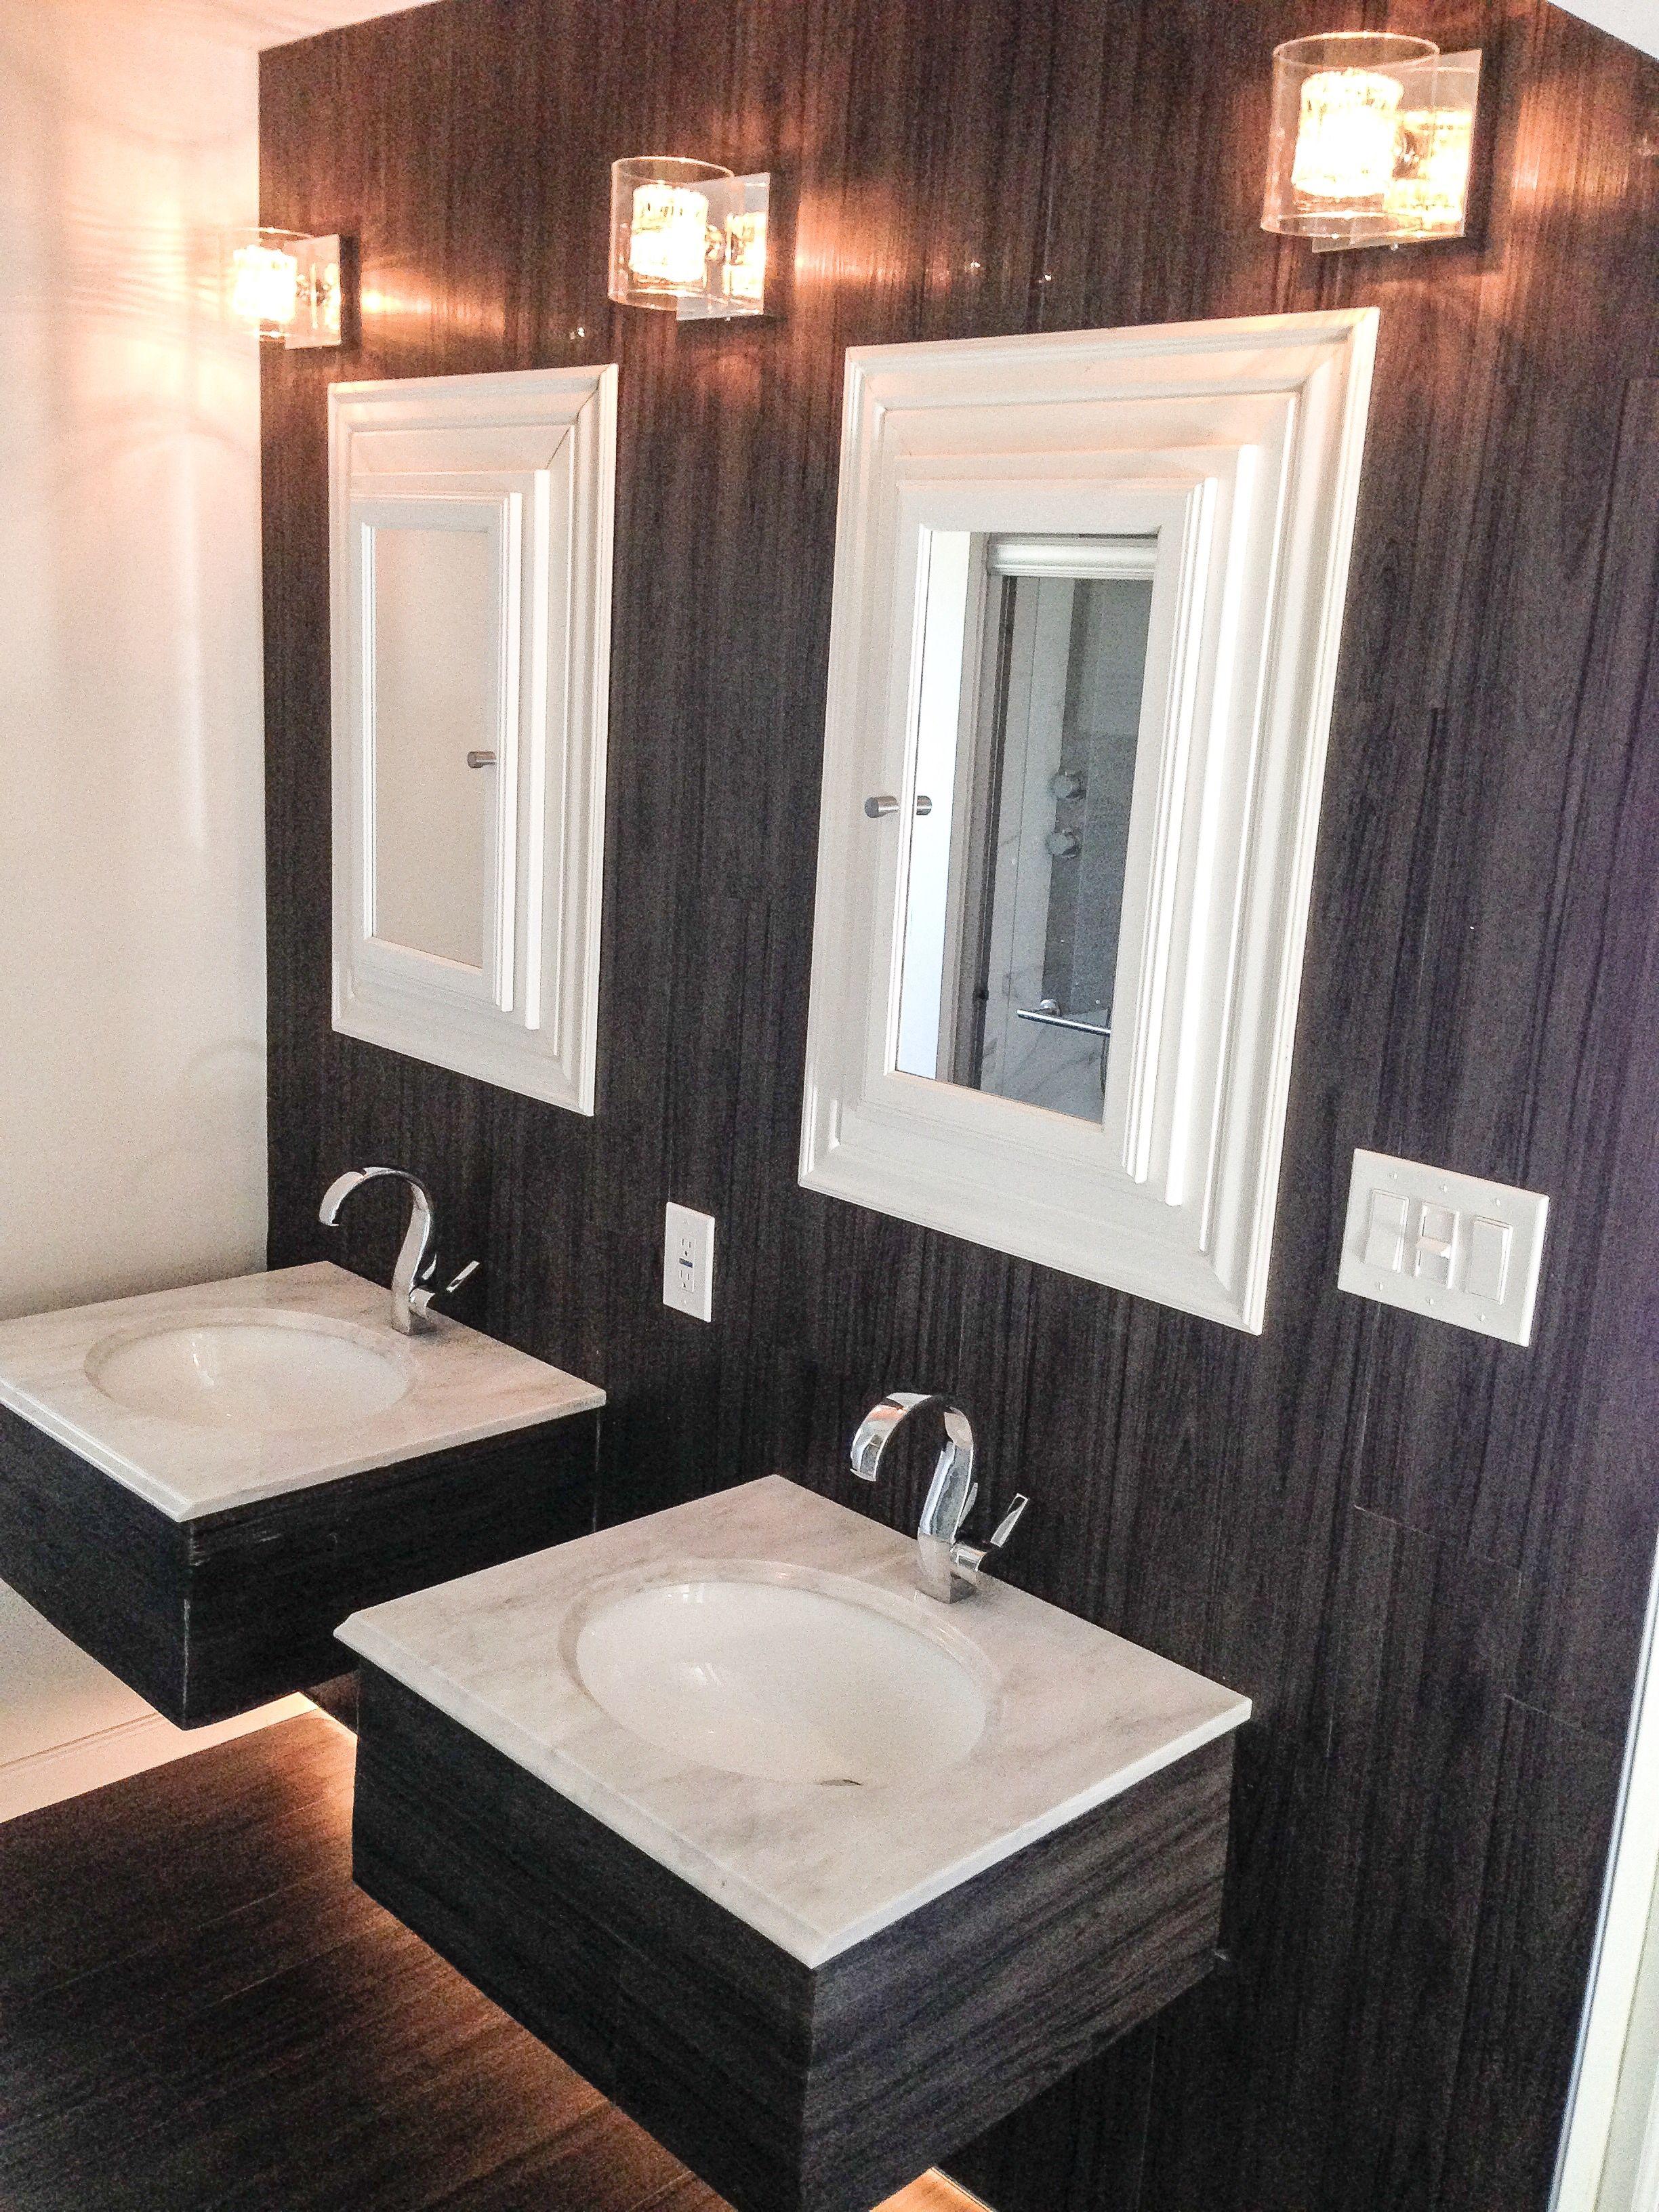 Vinyl plank floor installed on wall Bathroom double vanity